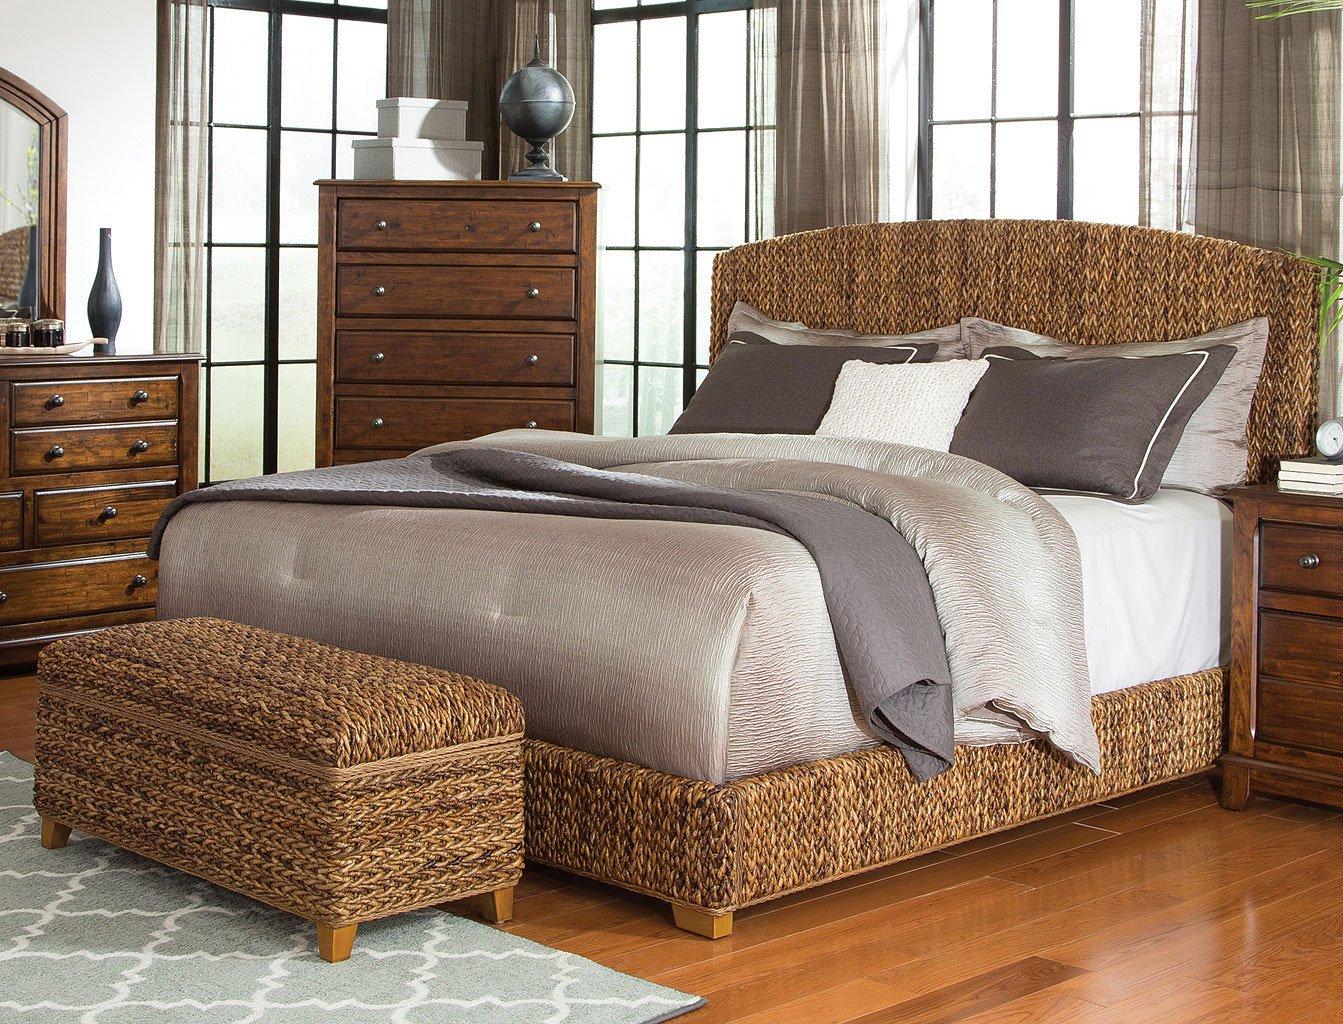 Laughton upholstered bedroom set natural brown by coaster furniture 1 reviews furniturepick for Coaster bedroom furniture reviews